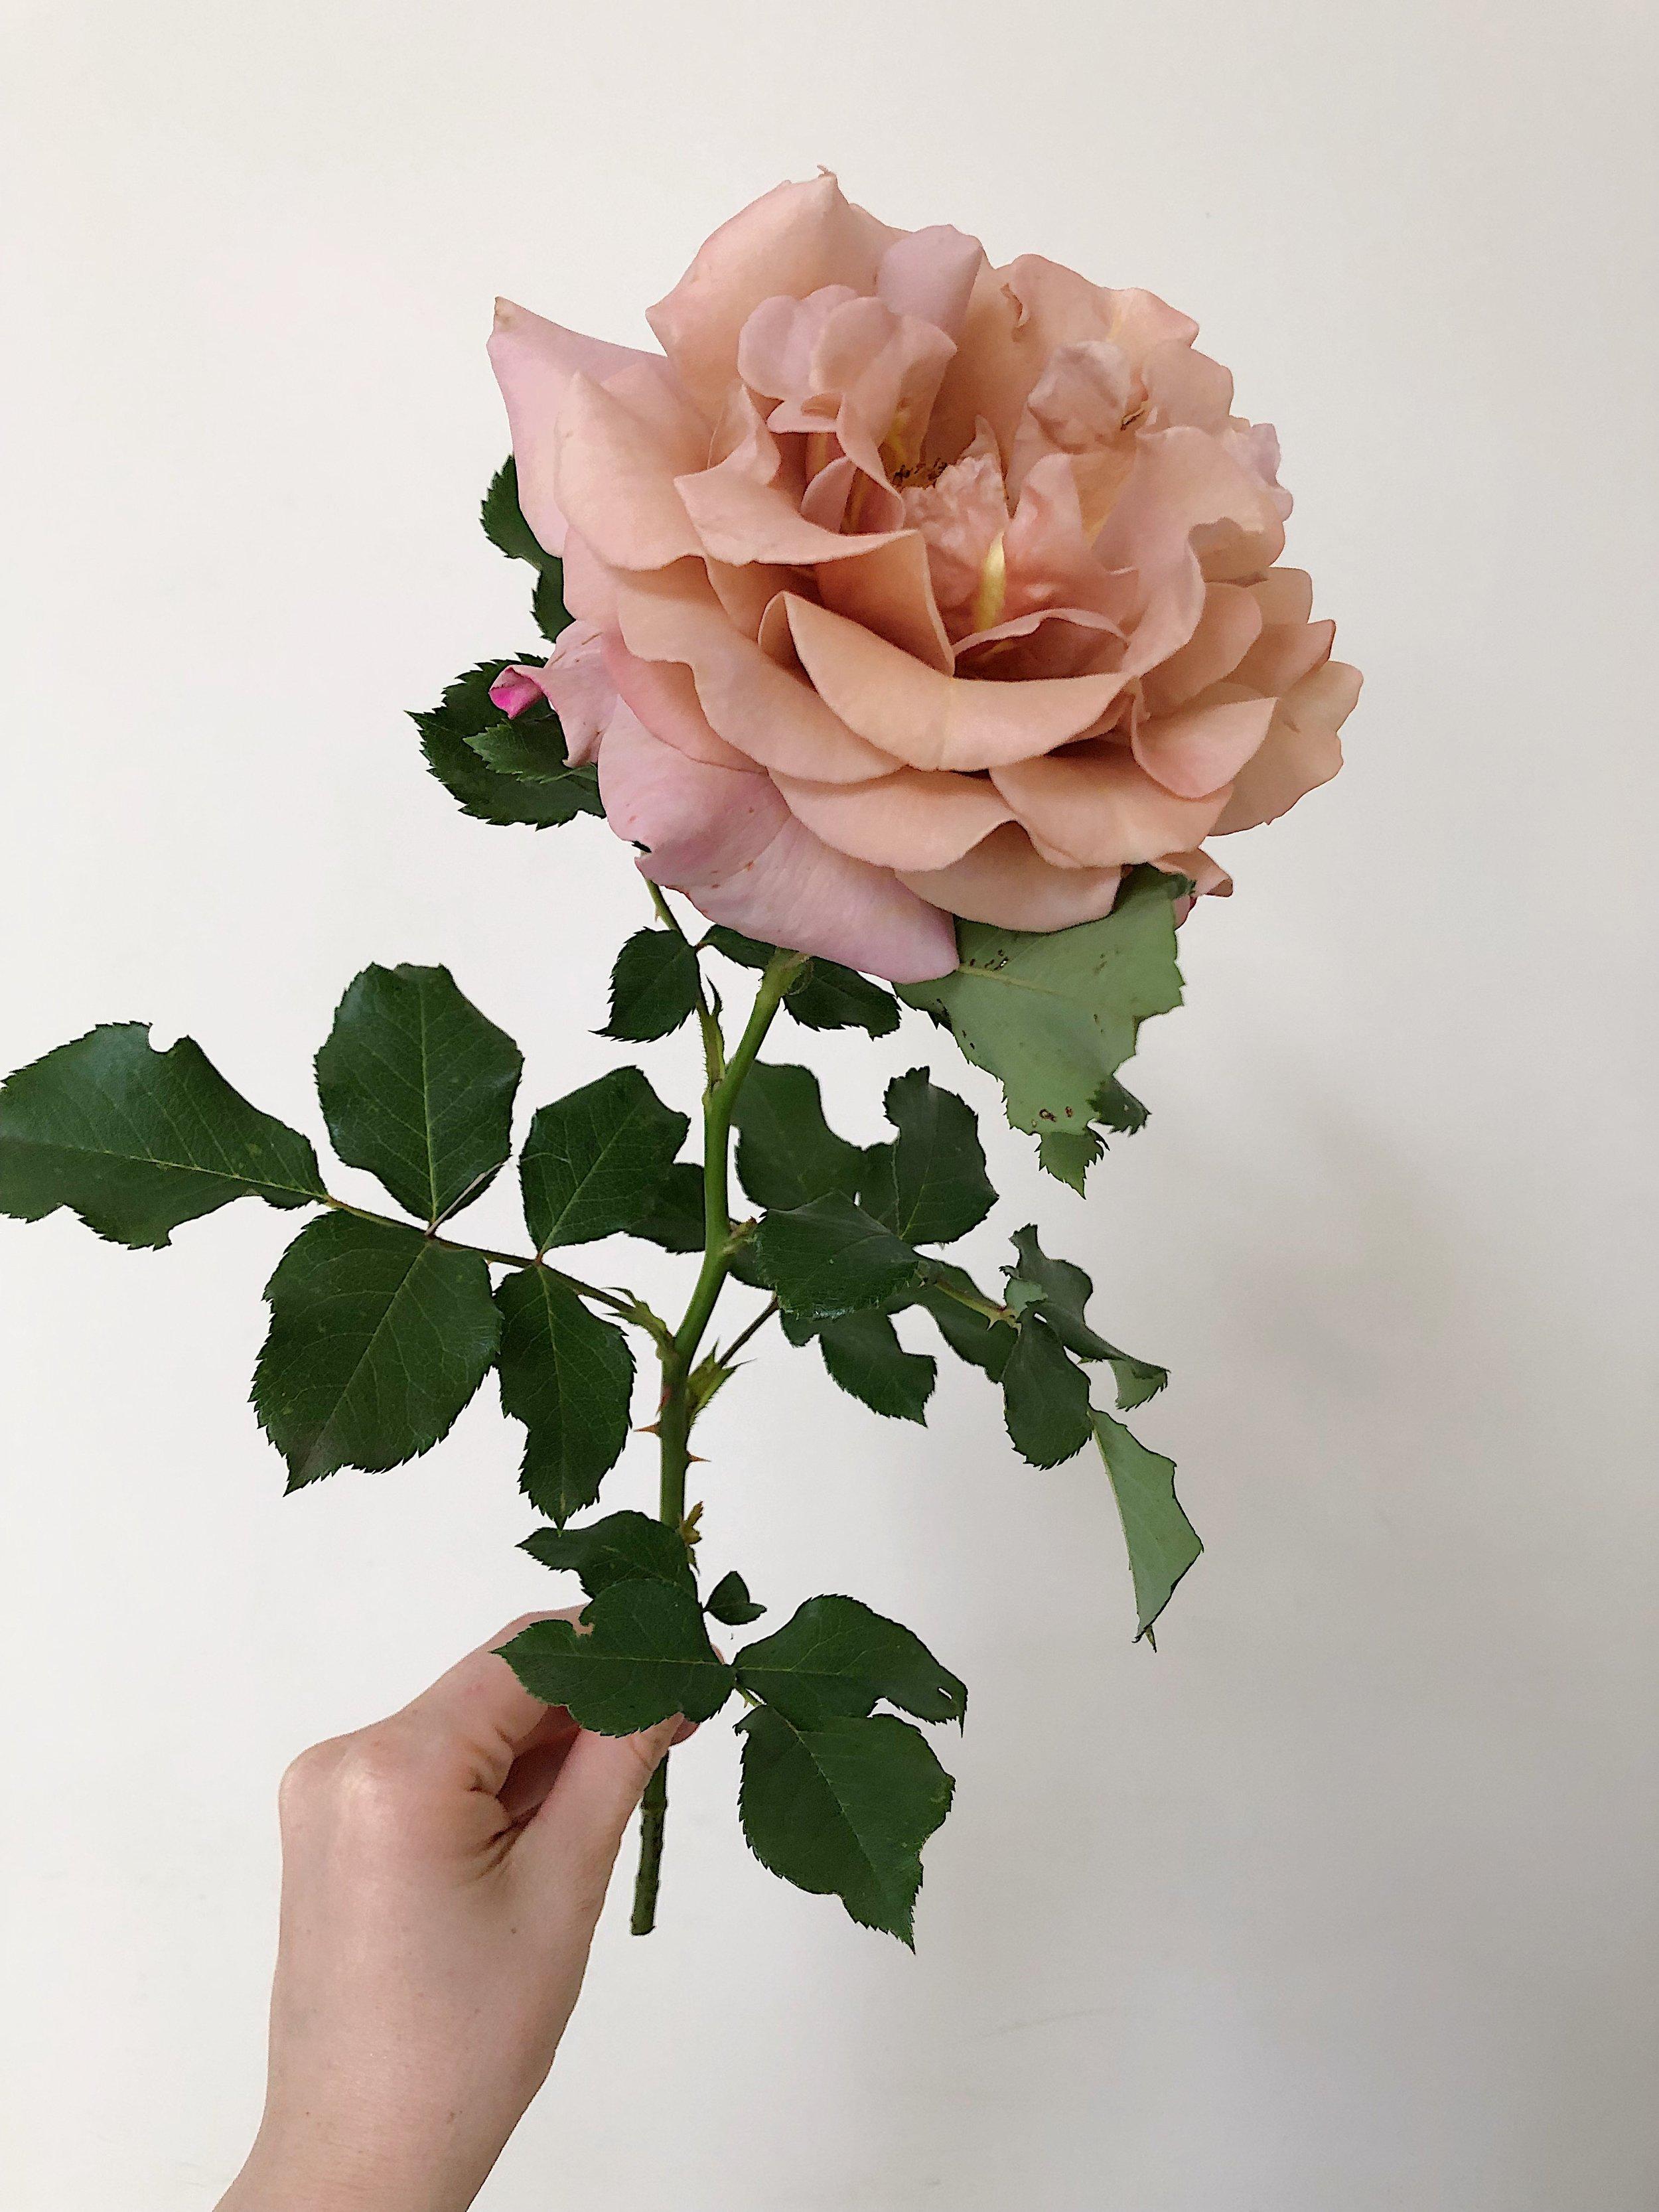 Koko Loco, garden rose